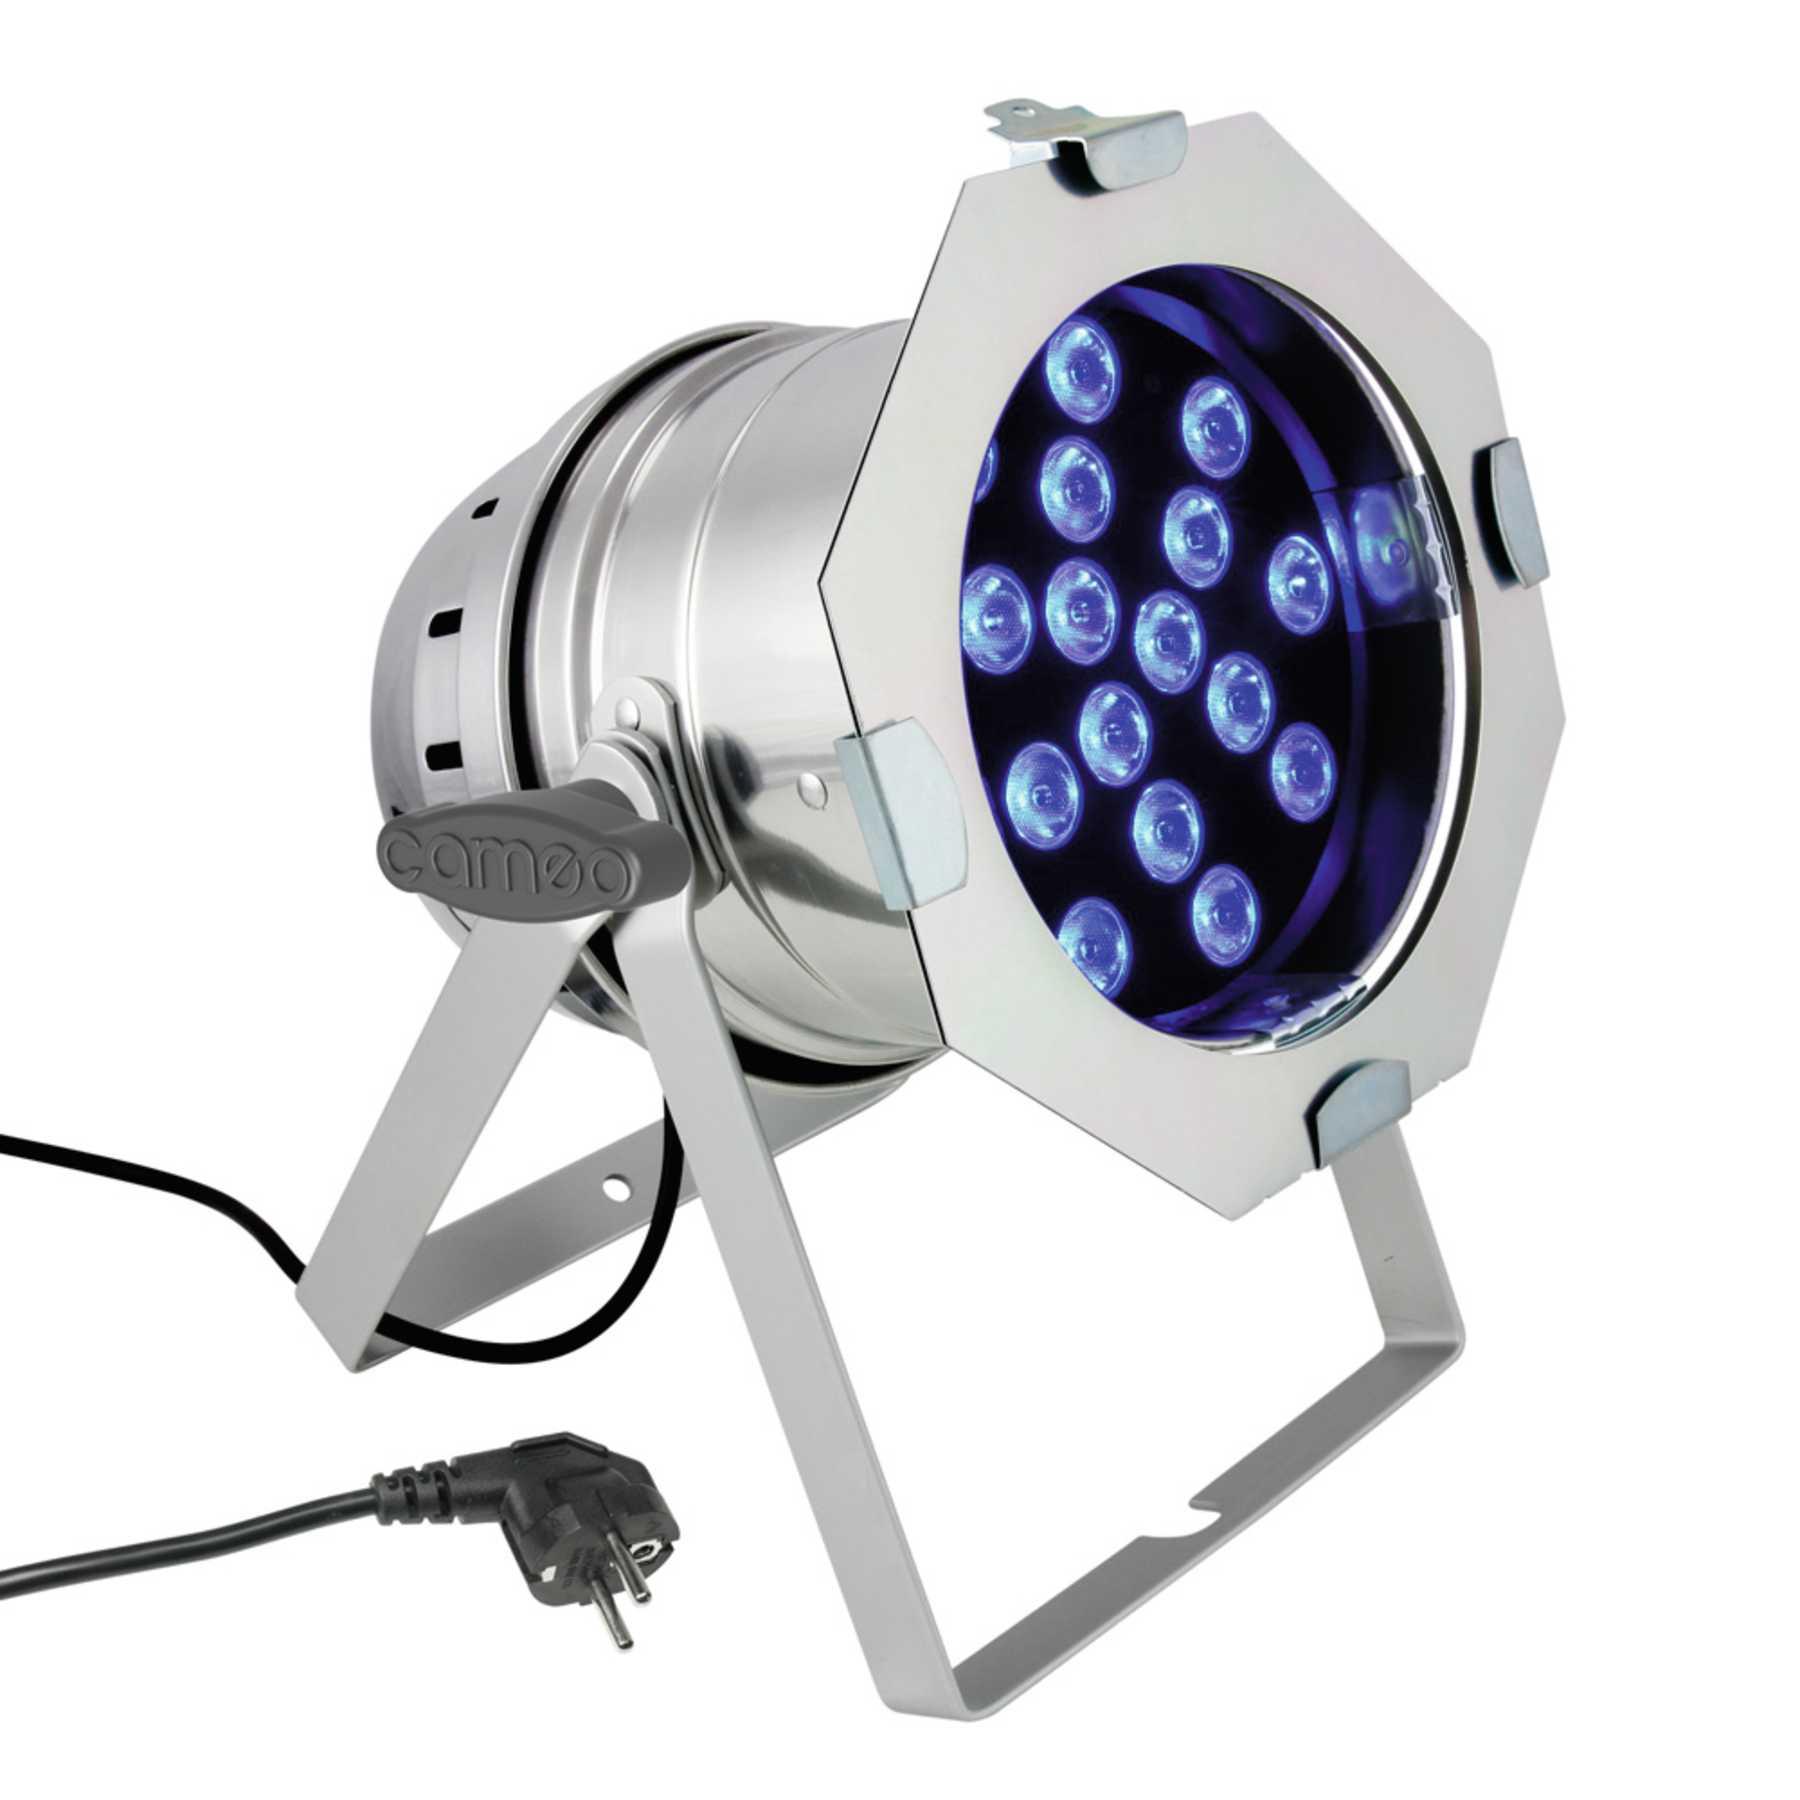 Cameo PAR 64 CAN 18 x 3 W TRI Colour LED RGB PAR Scheinwerfer in poliertem Gehäuse 229848